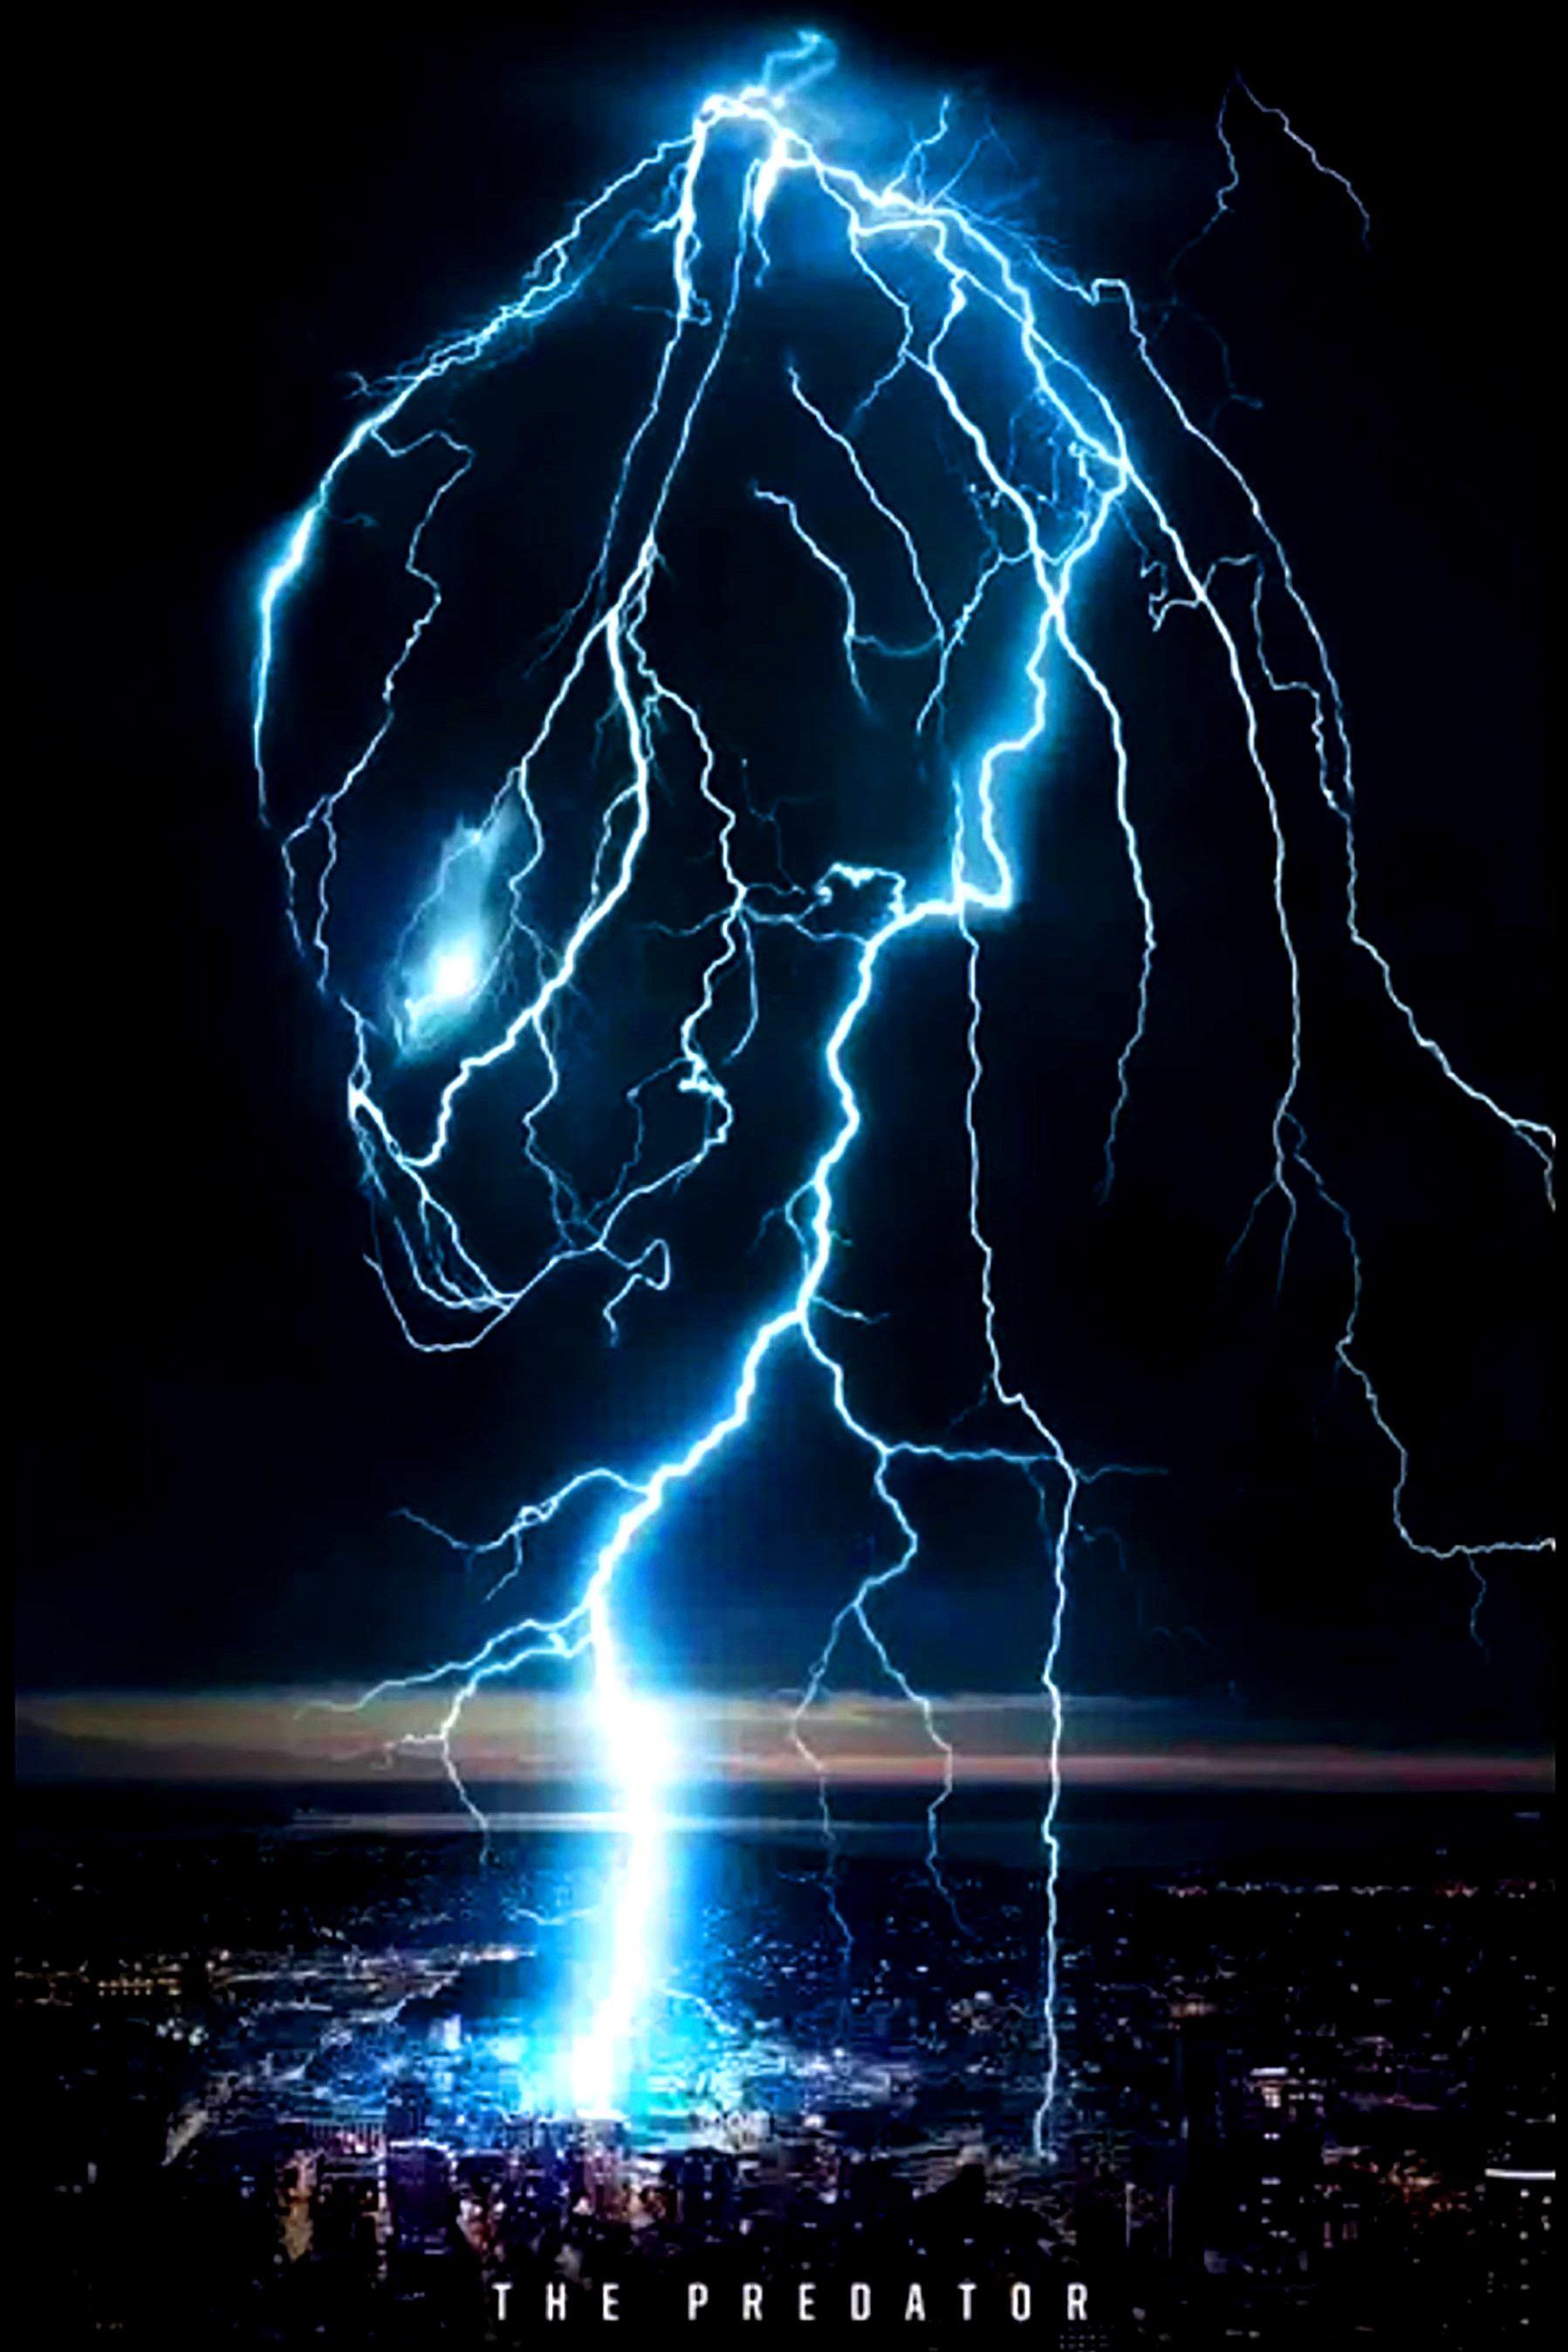 Horror movie hotties aliens predator requiem order desc